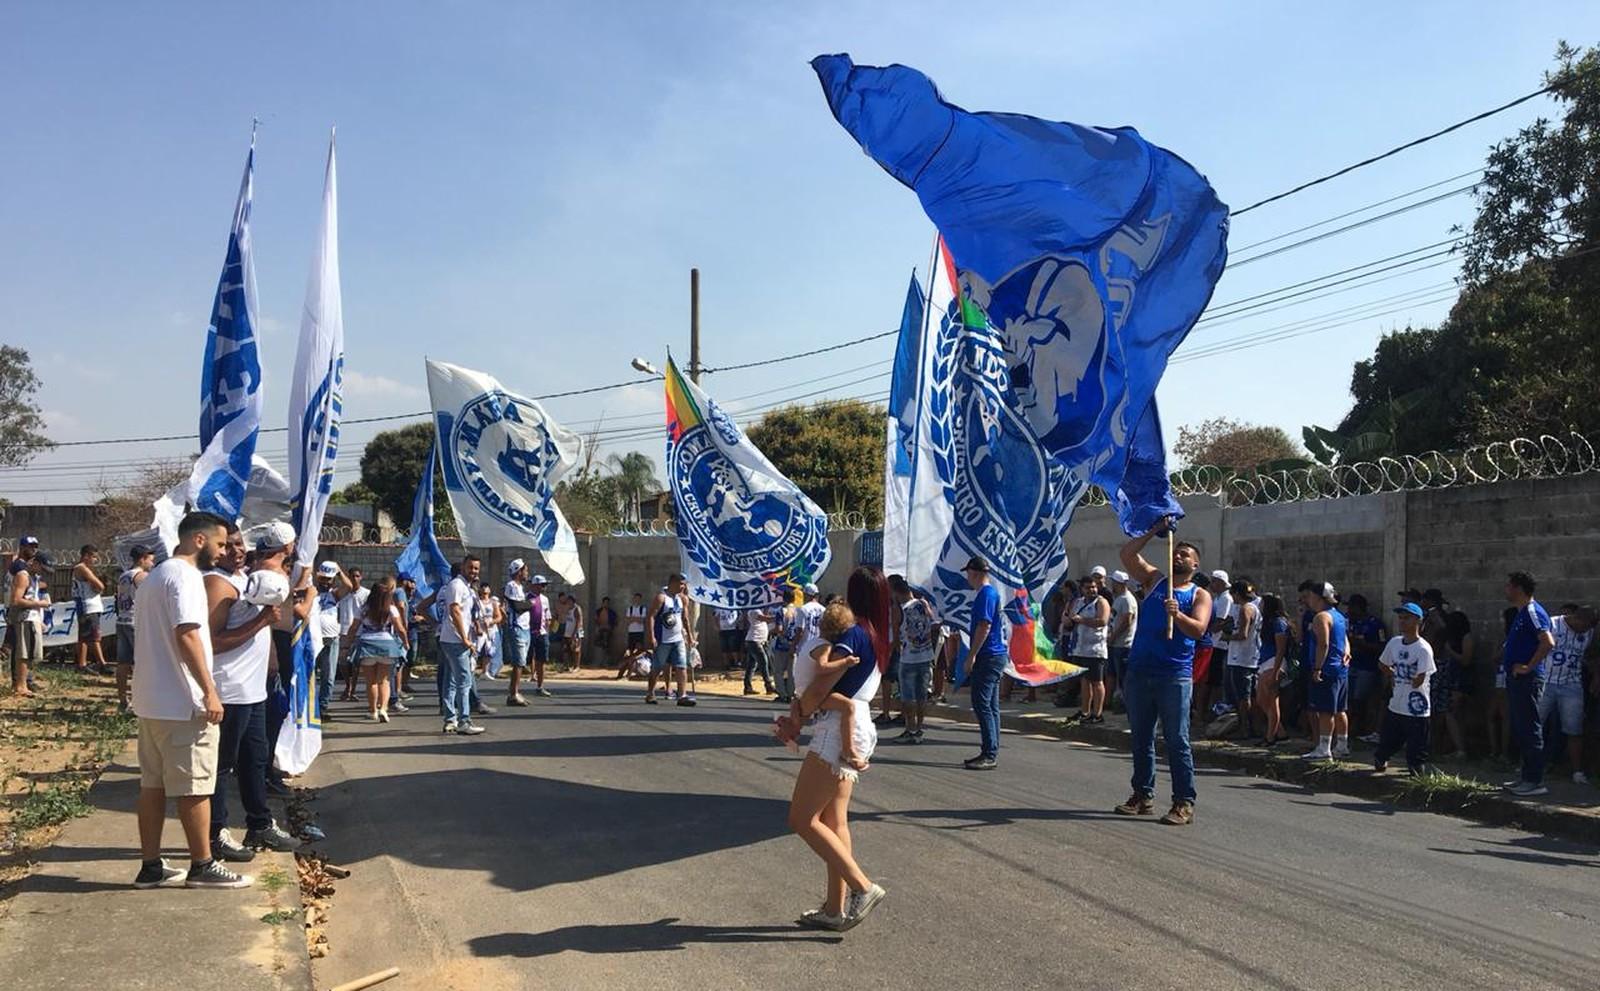 Torcida protesta na Toca da Raposa (Foto: Isamara Fernandes)